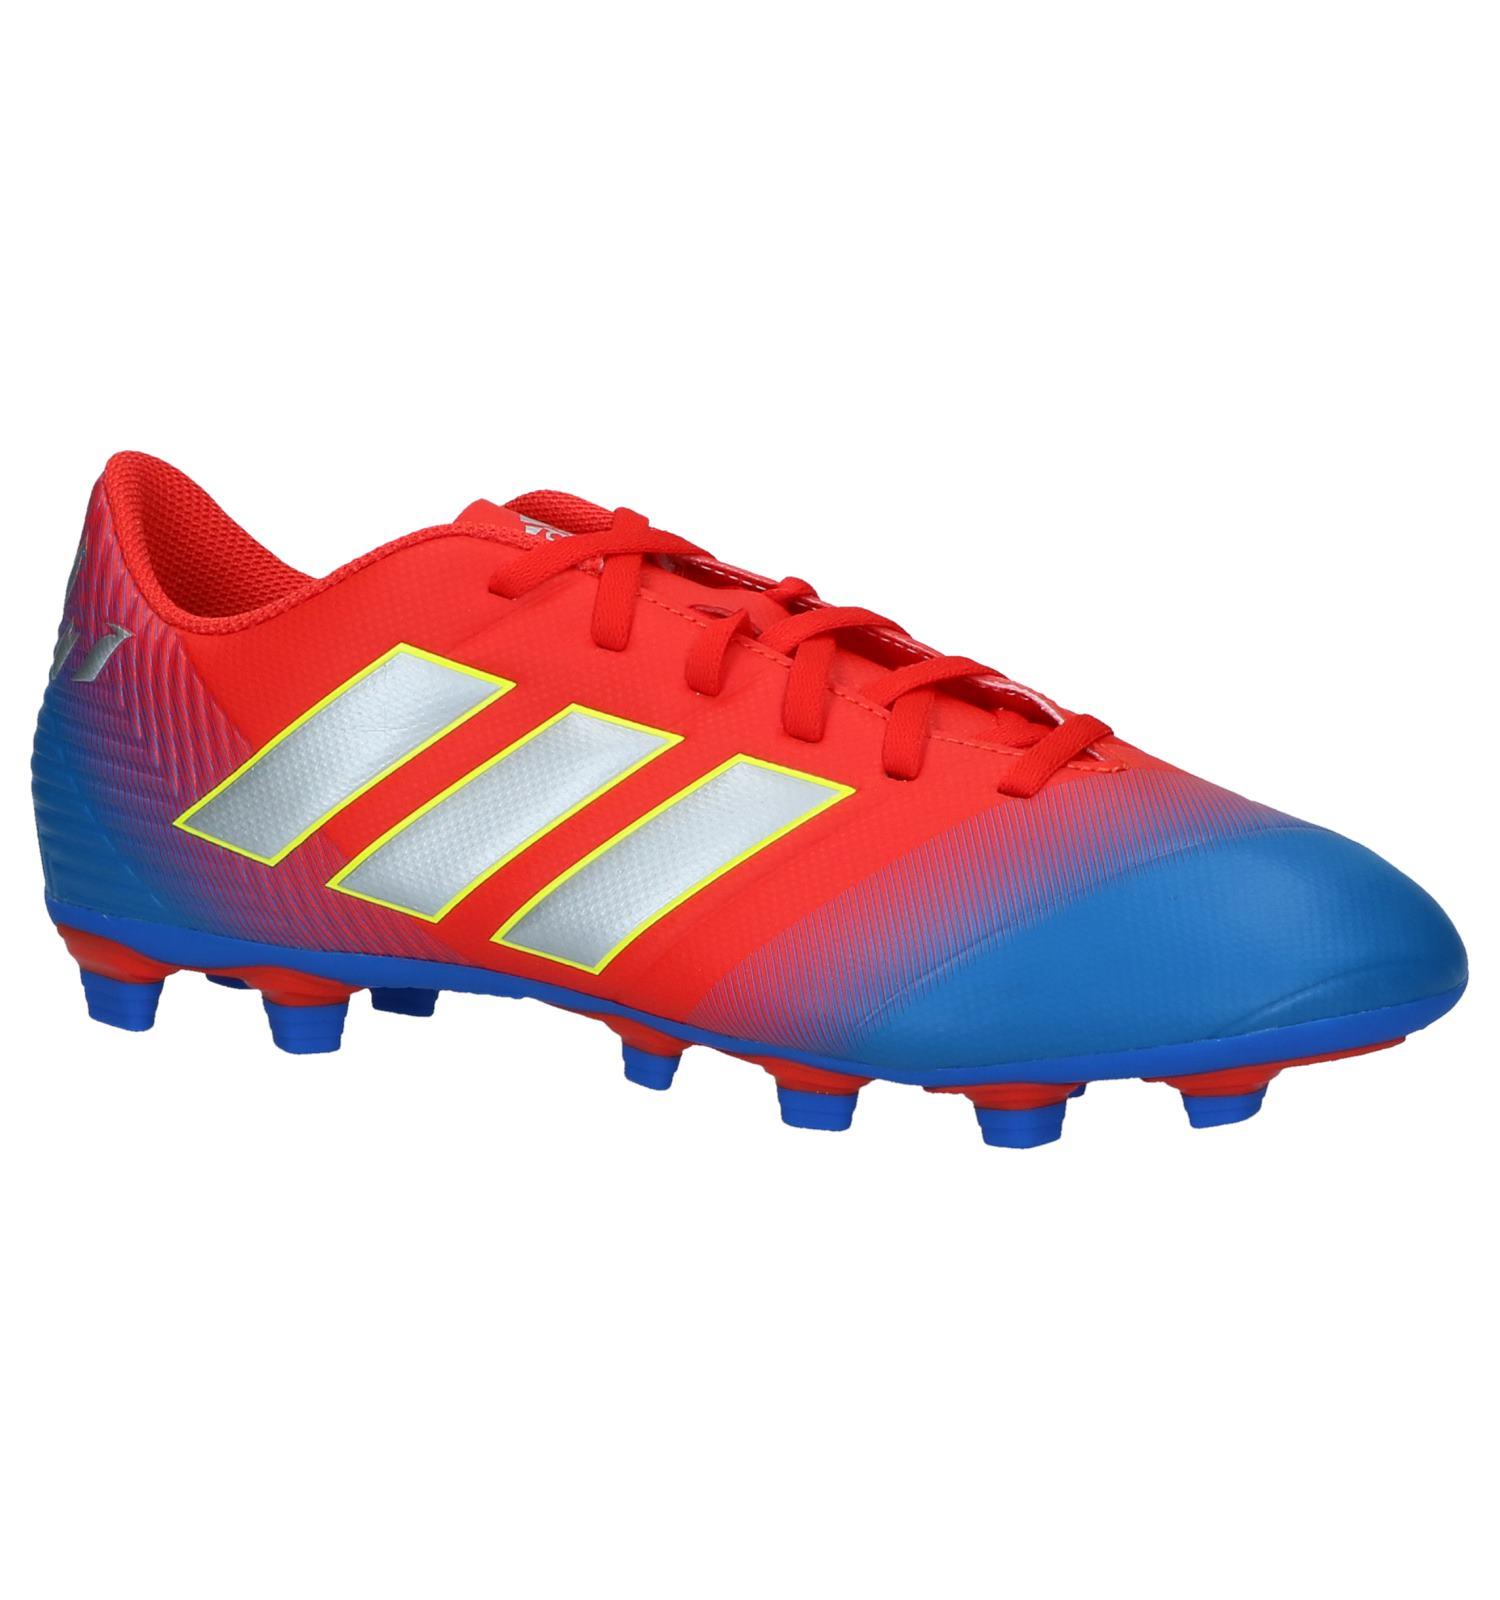 adidas voetbalschoenen 2018 wk